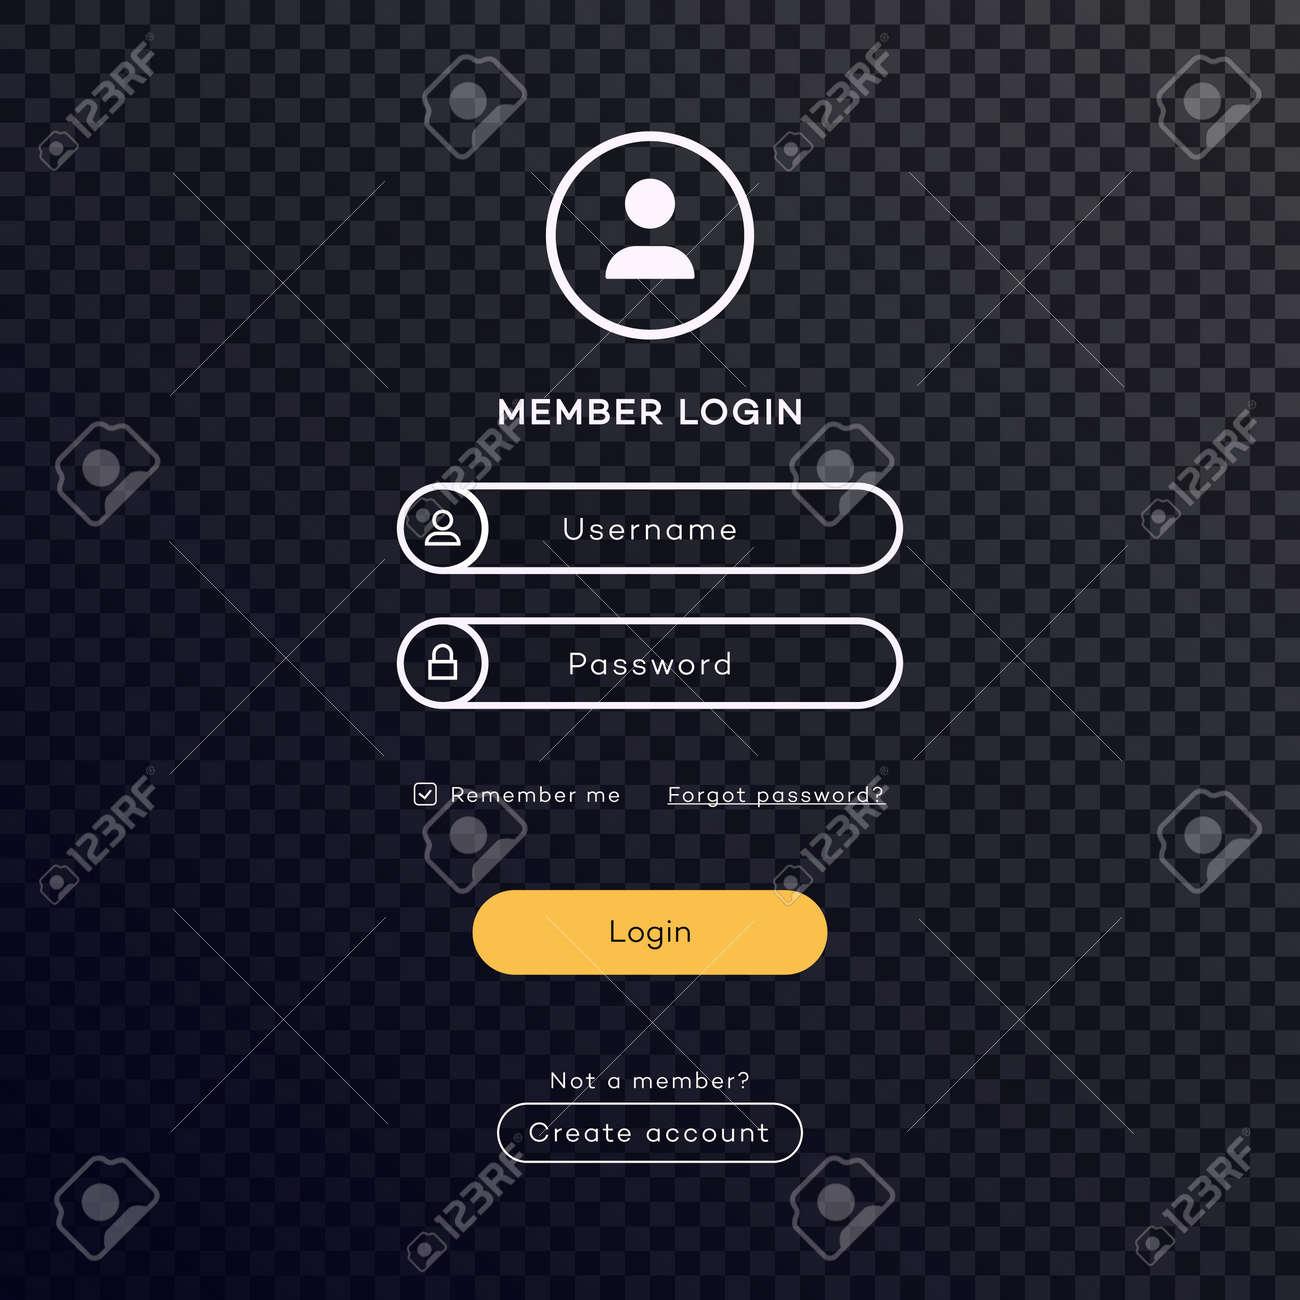 Login form page dark theme on transparent background for app